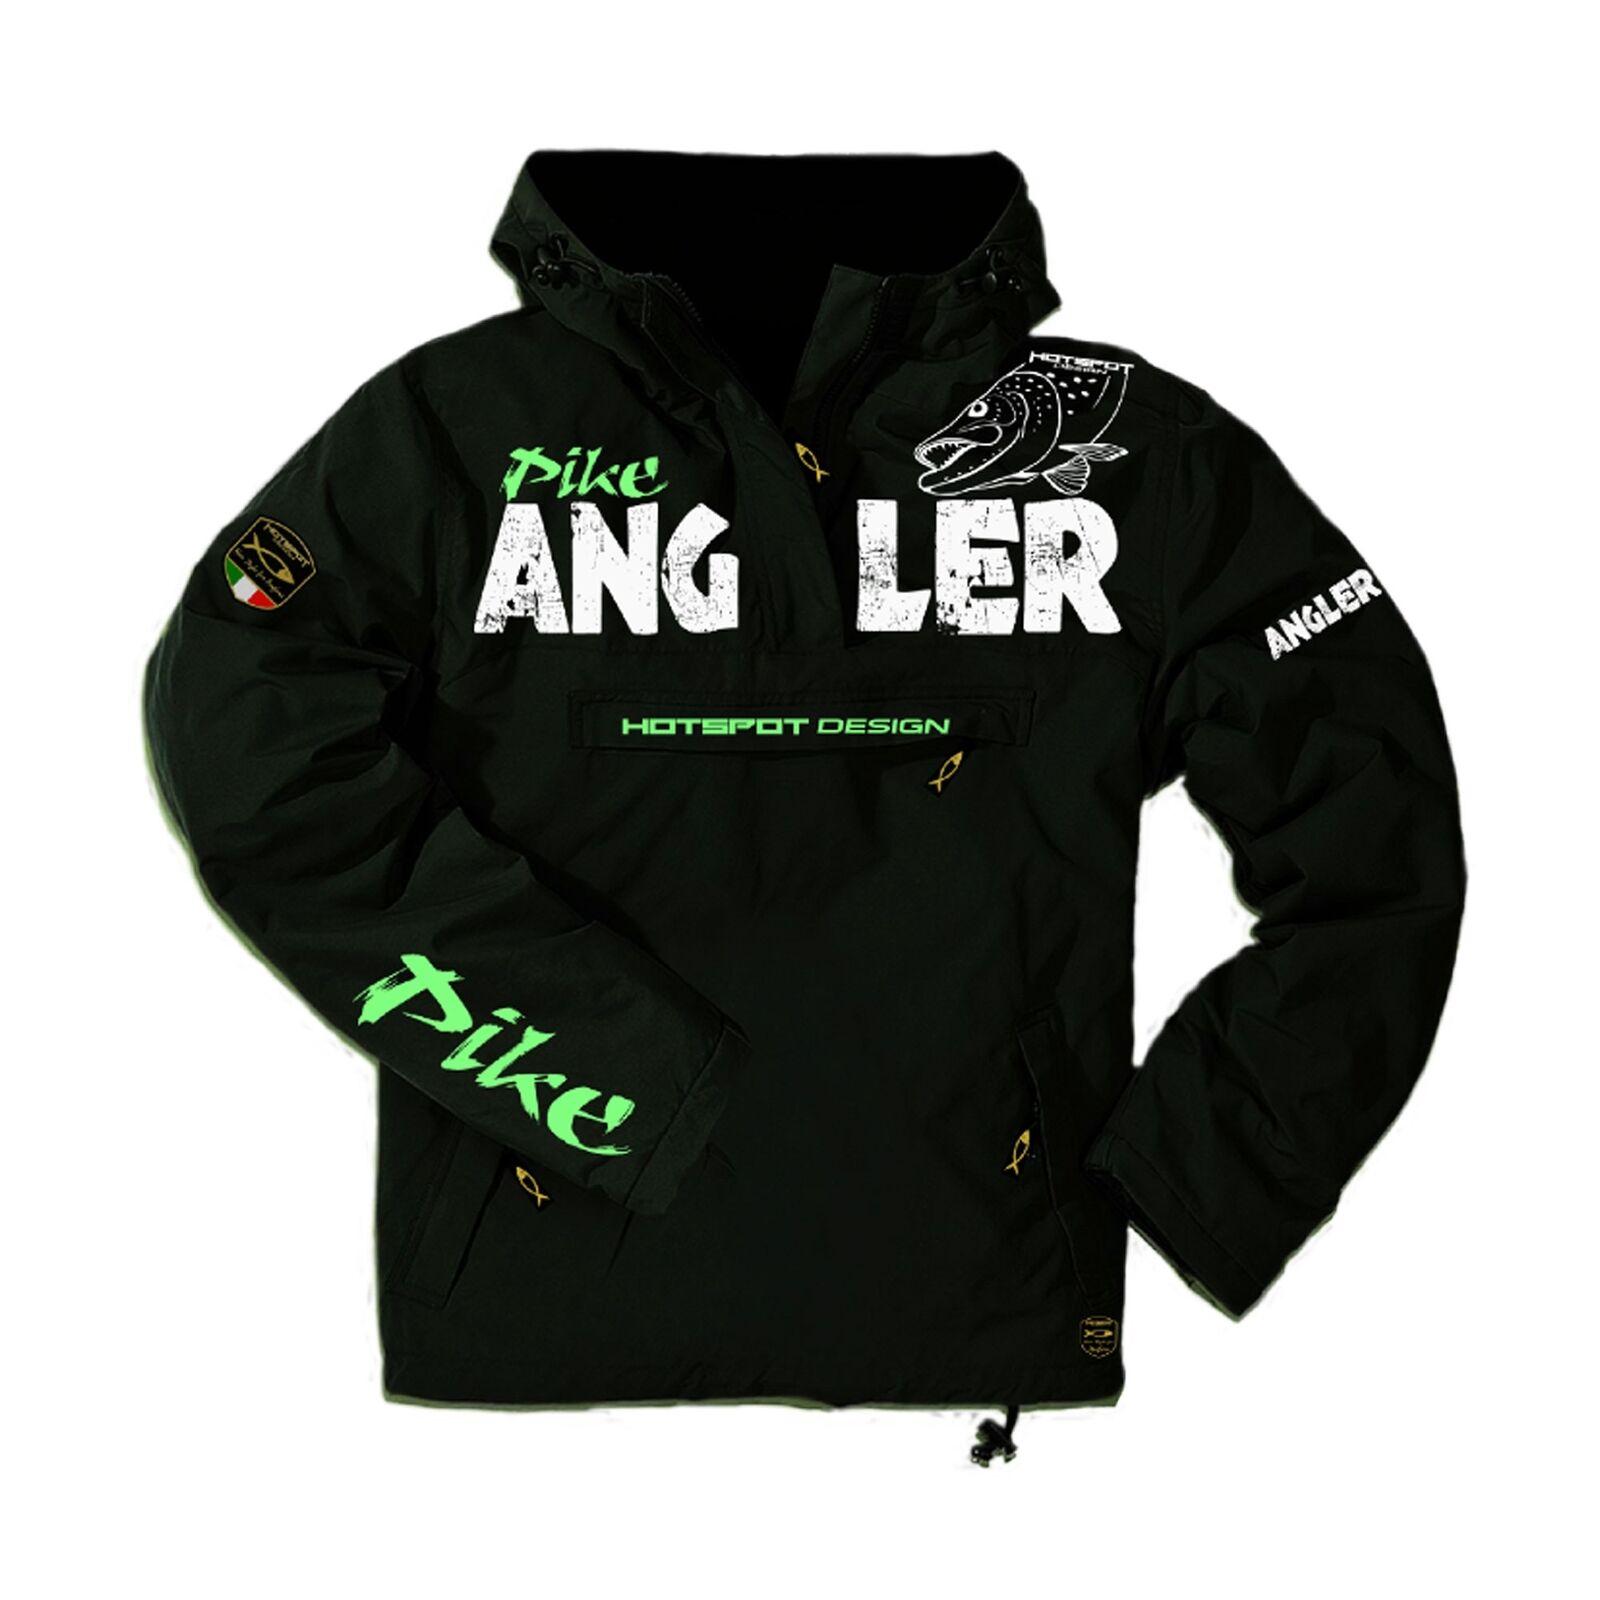 Angel chaqueta Pike Hoodie Angler suéter Hecht projoador hotspot Design